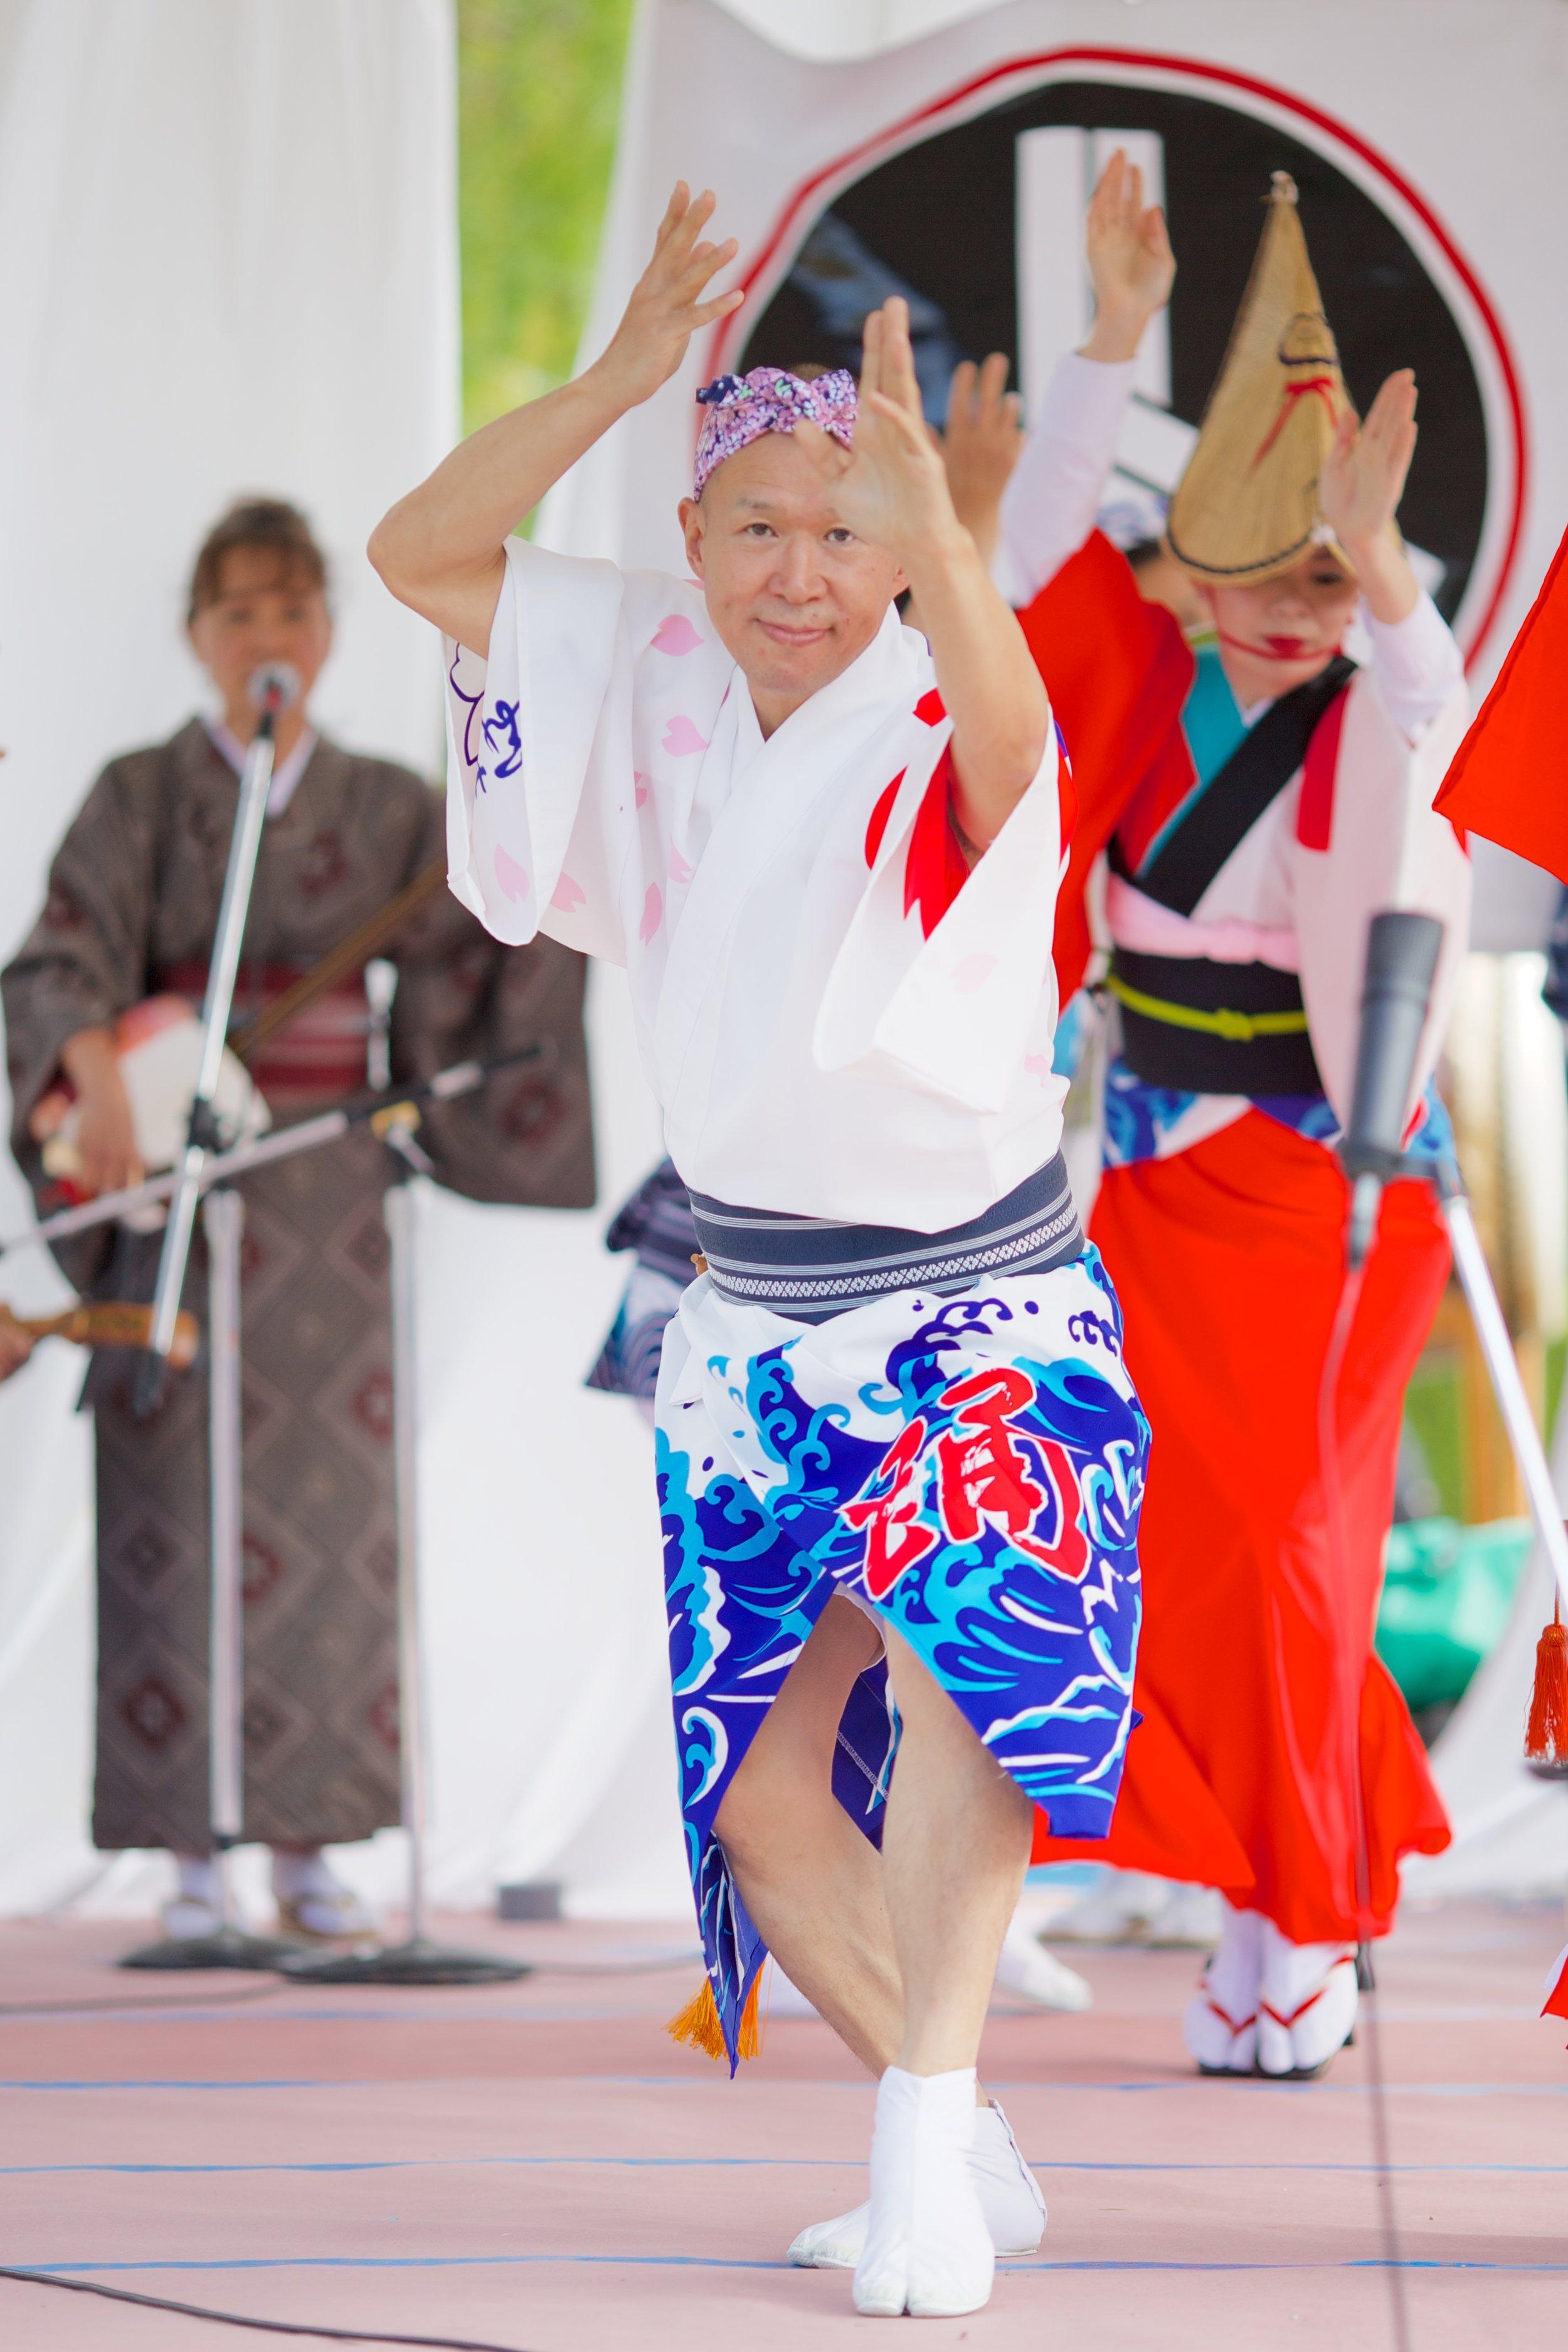 sakura-ren---japanese-cultural-fair-of-santa-cruz-2015_19570450556_o.jpg